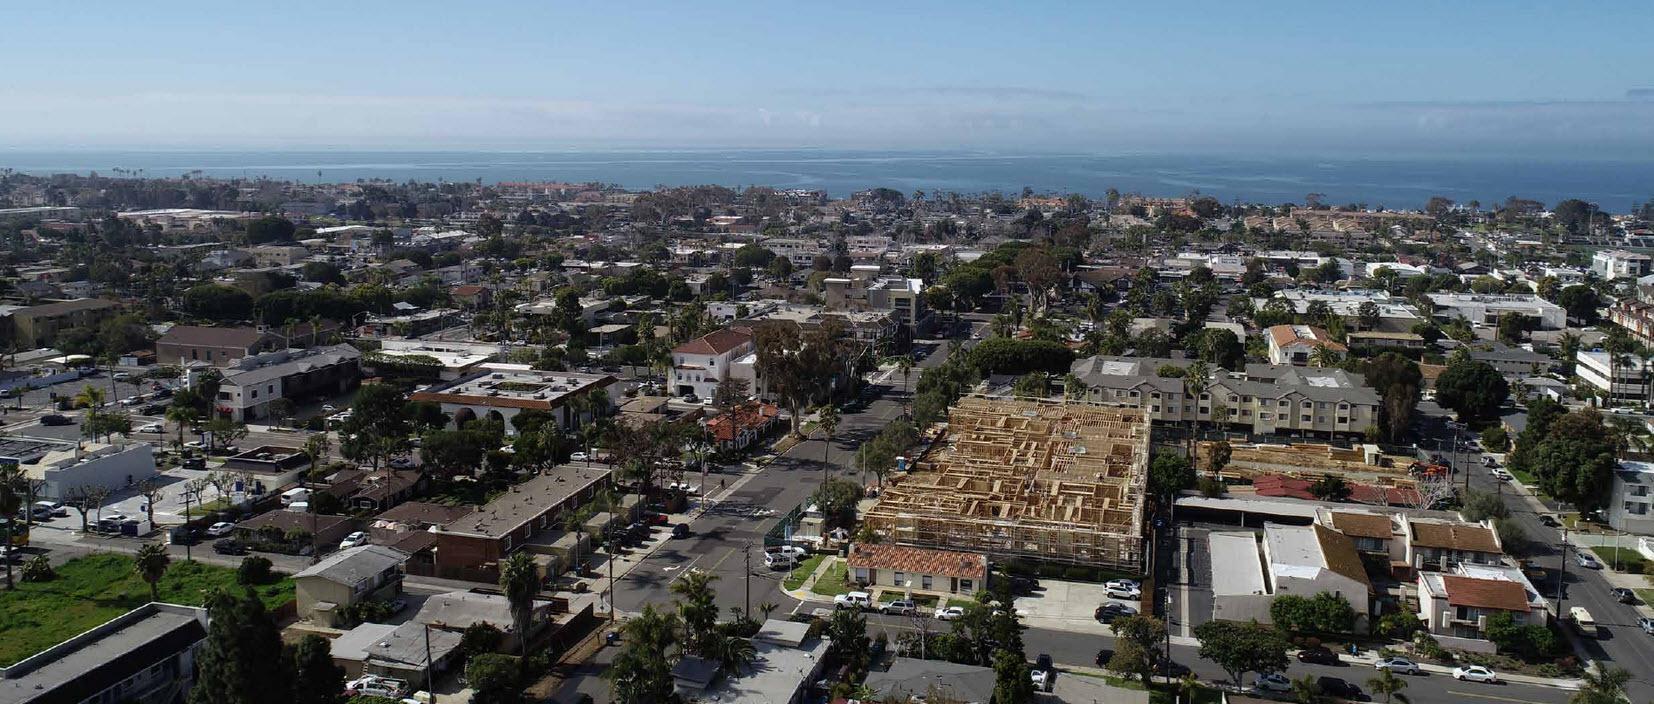 'Carlyle Carlsbad Village' by Carlyle Carlsbad Village in San Diego